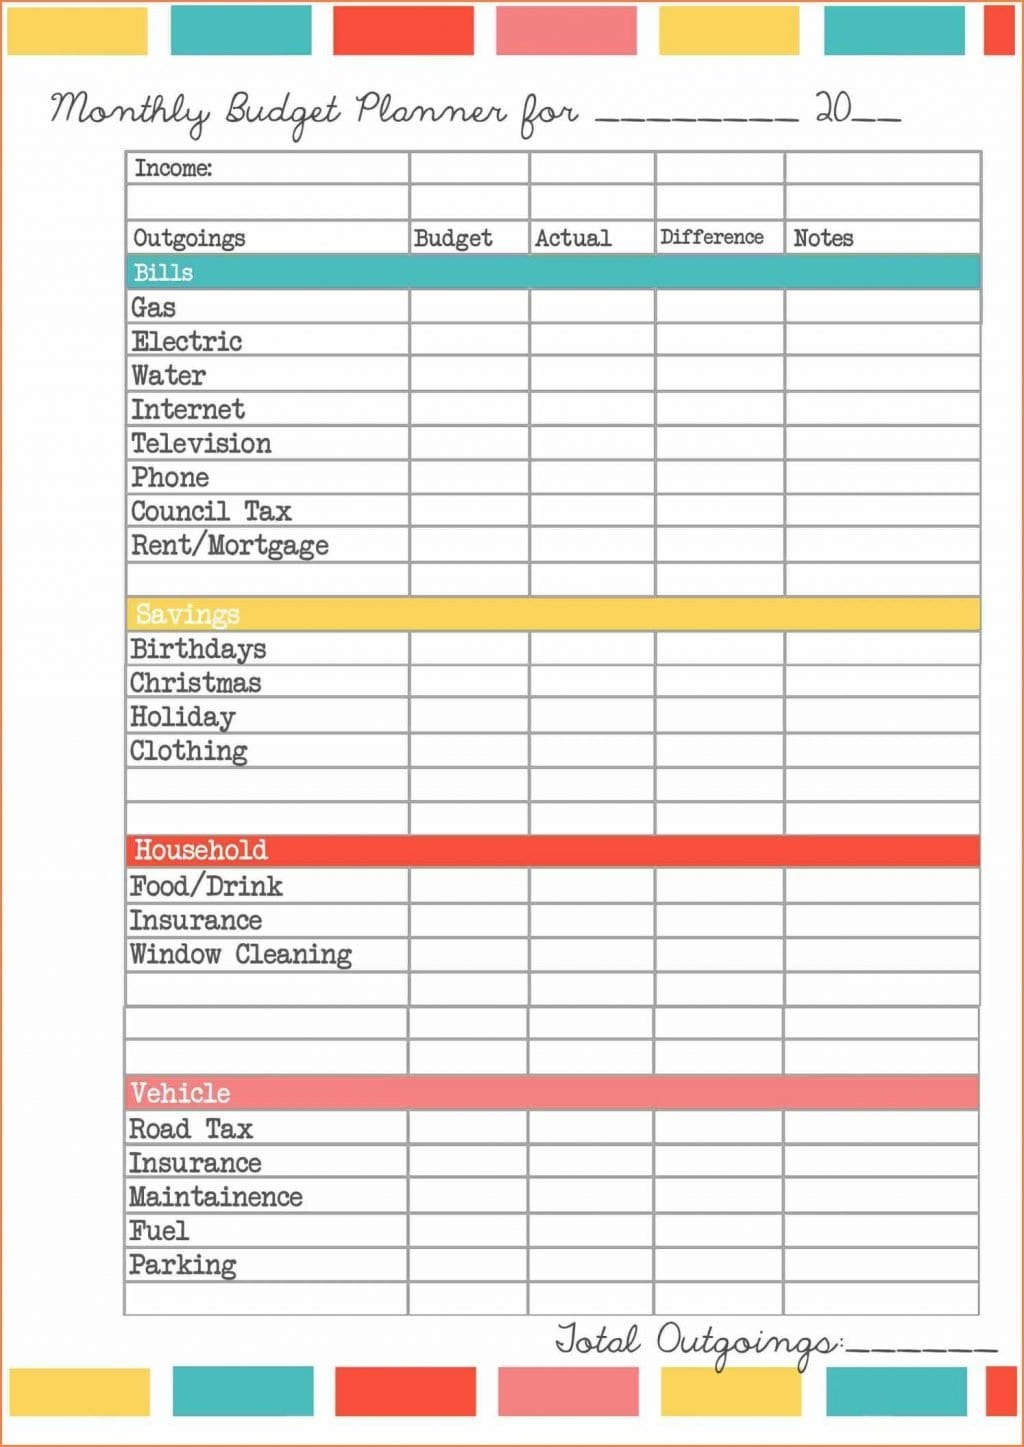 Fidelity Retirement Income Ning Worksheet Merrill Lynch Canada Acap Regarding Fidelity Retirement Income Planner Worksheet